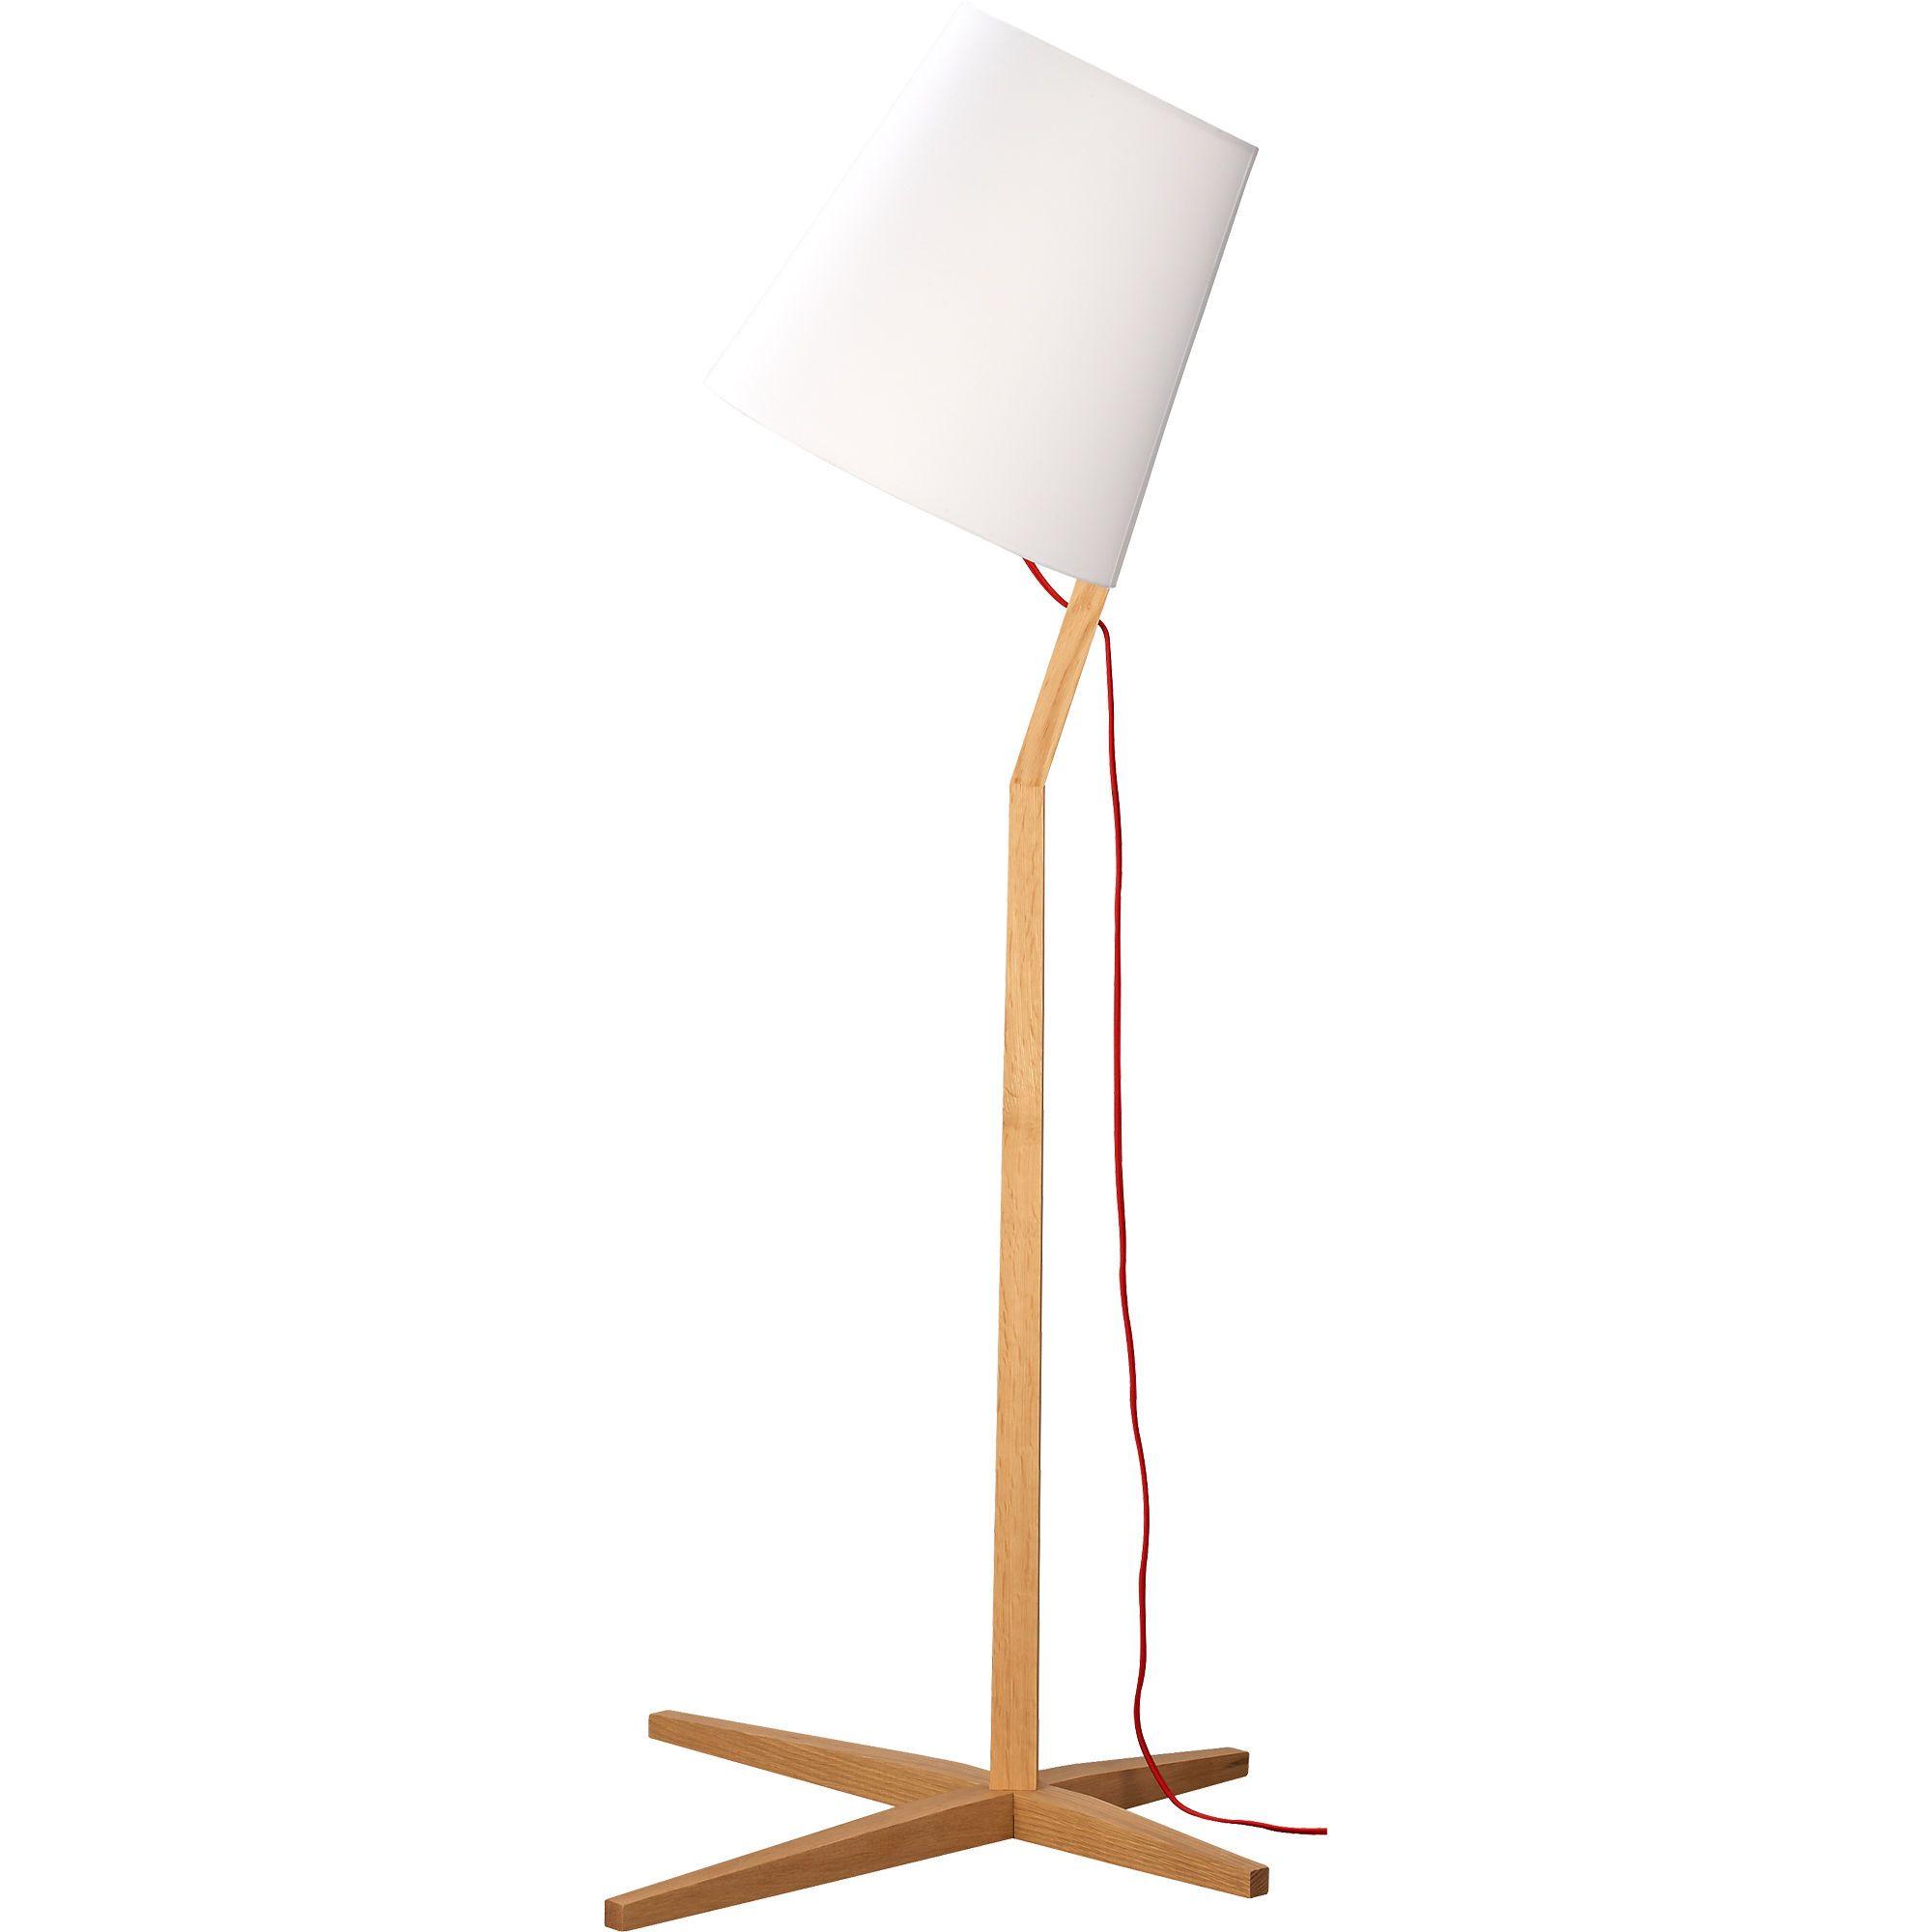 fujiya floor lamp in floor lamps   CB2